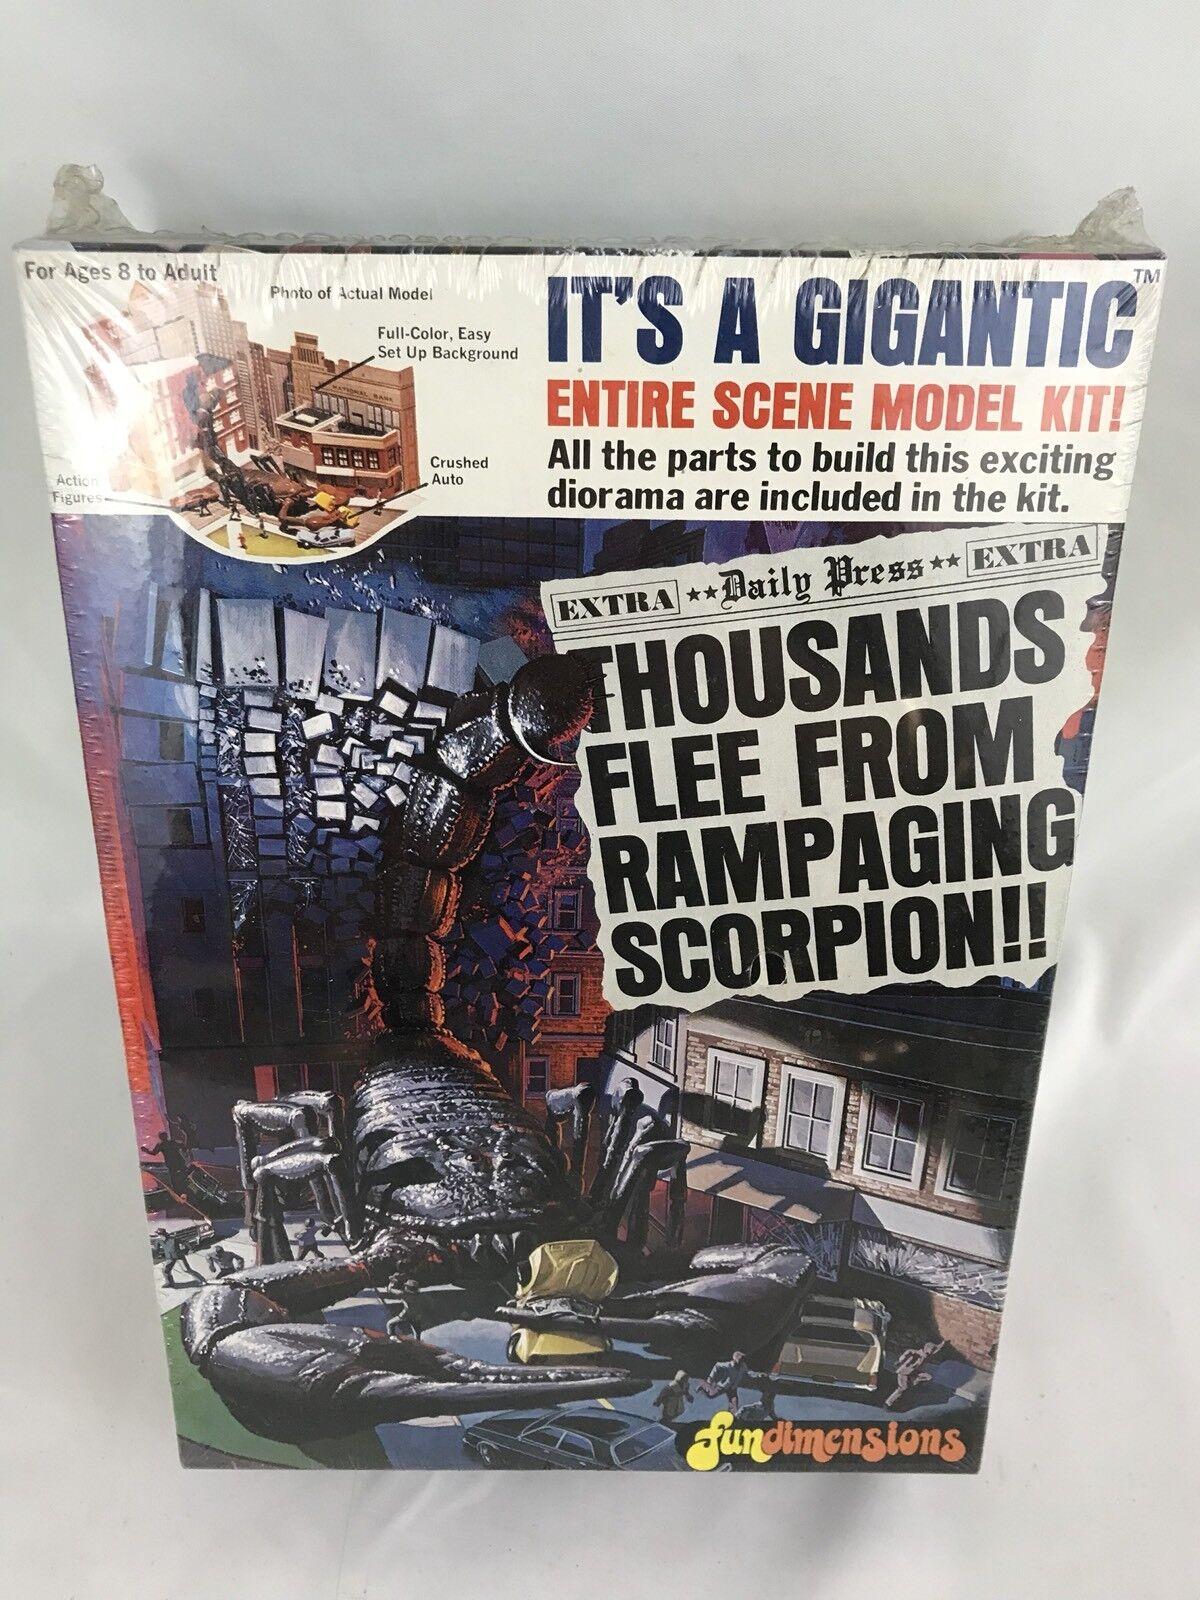 1970's Fun Dimensions Rampaging Scorpion Model Kit Rare Sealed New